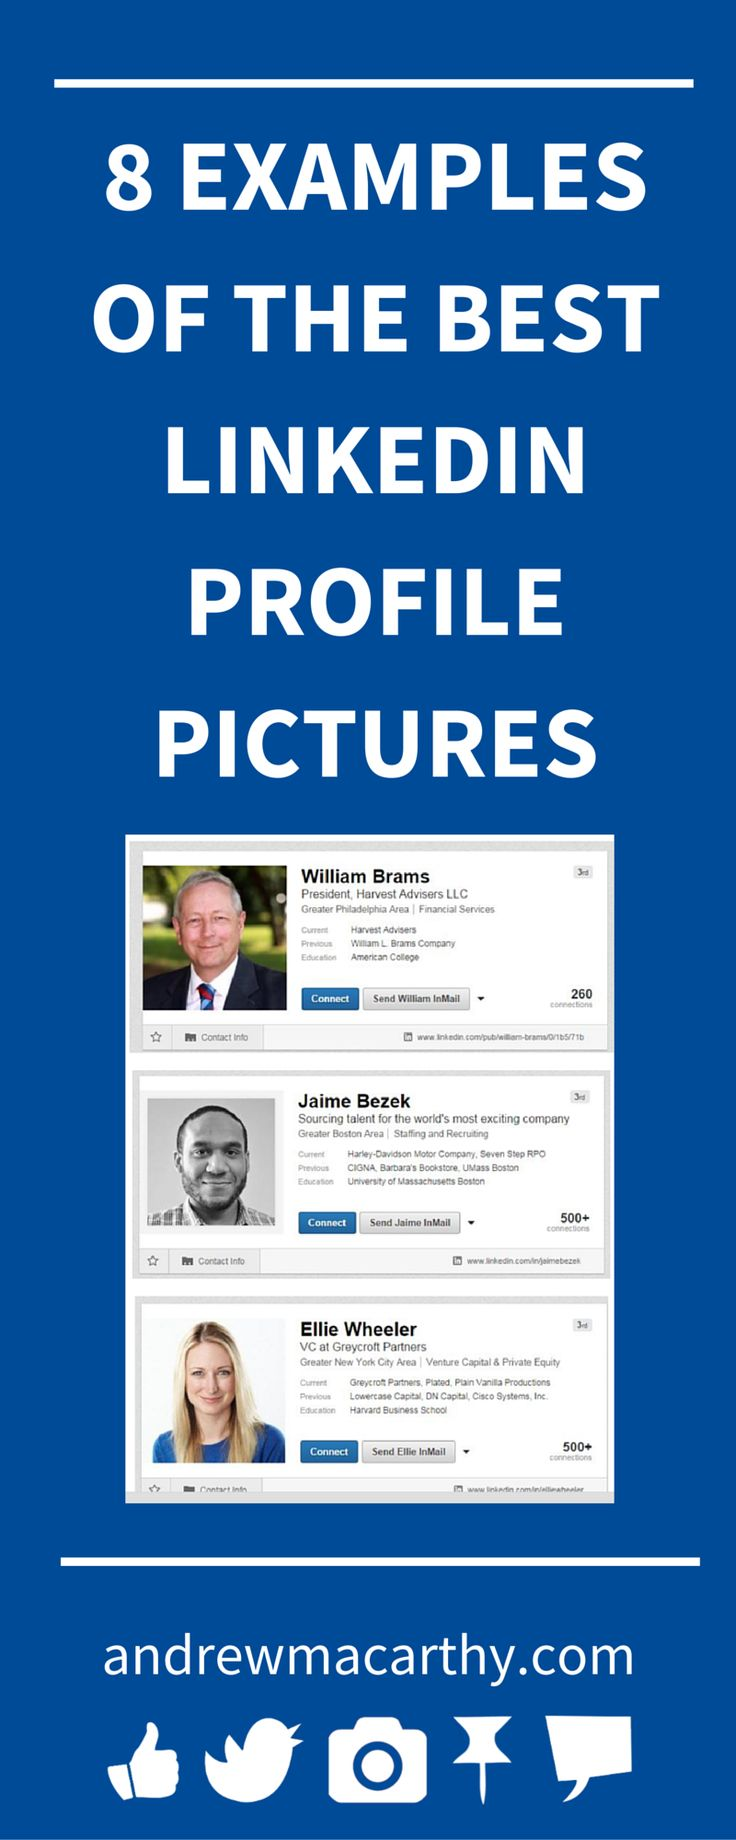 LinkedIn Profile Photo Tips 8 Examples of Best LinkedIn